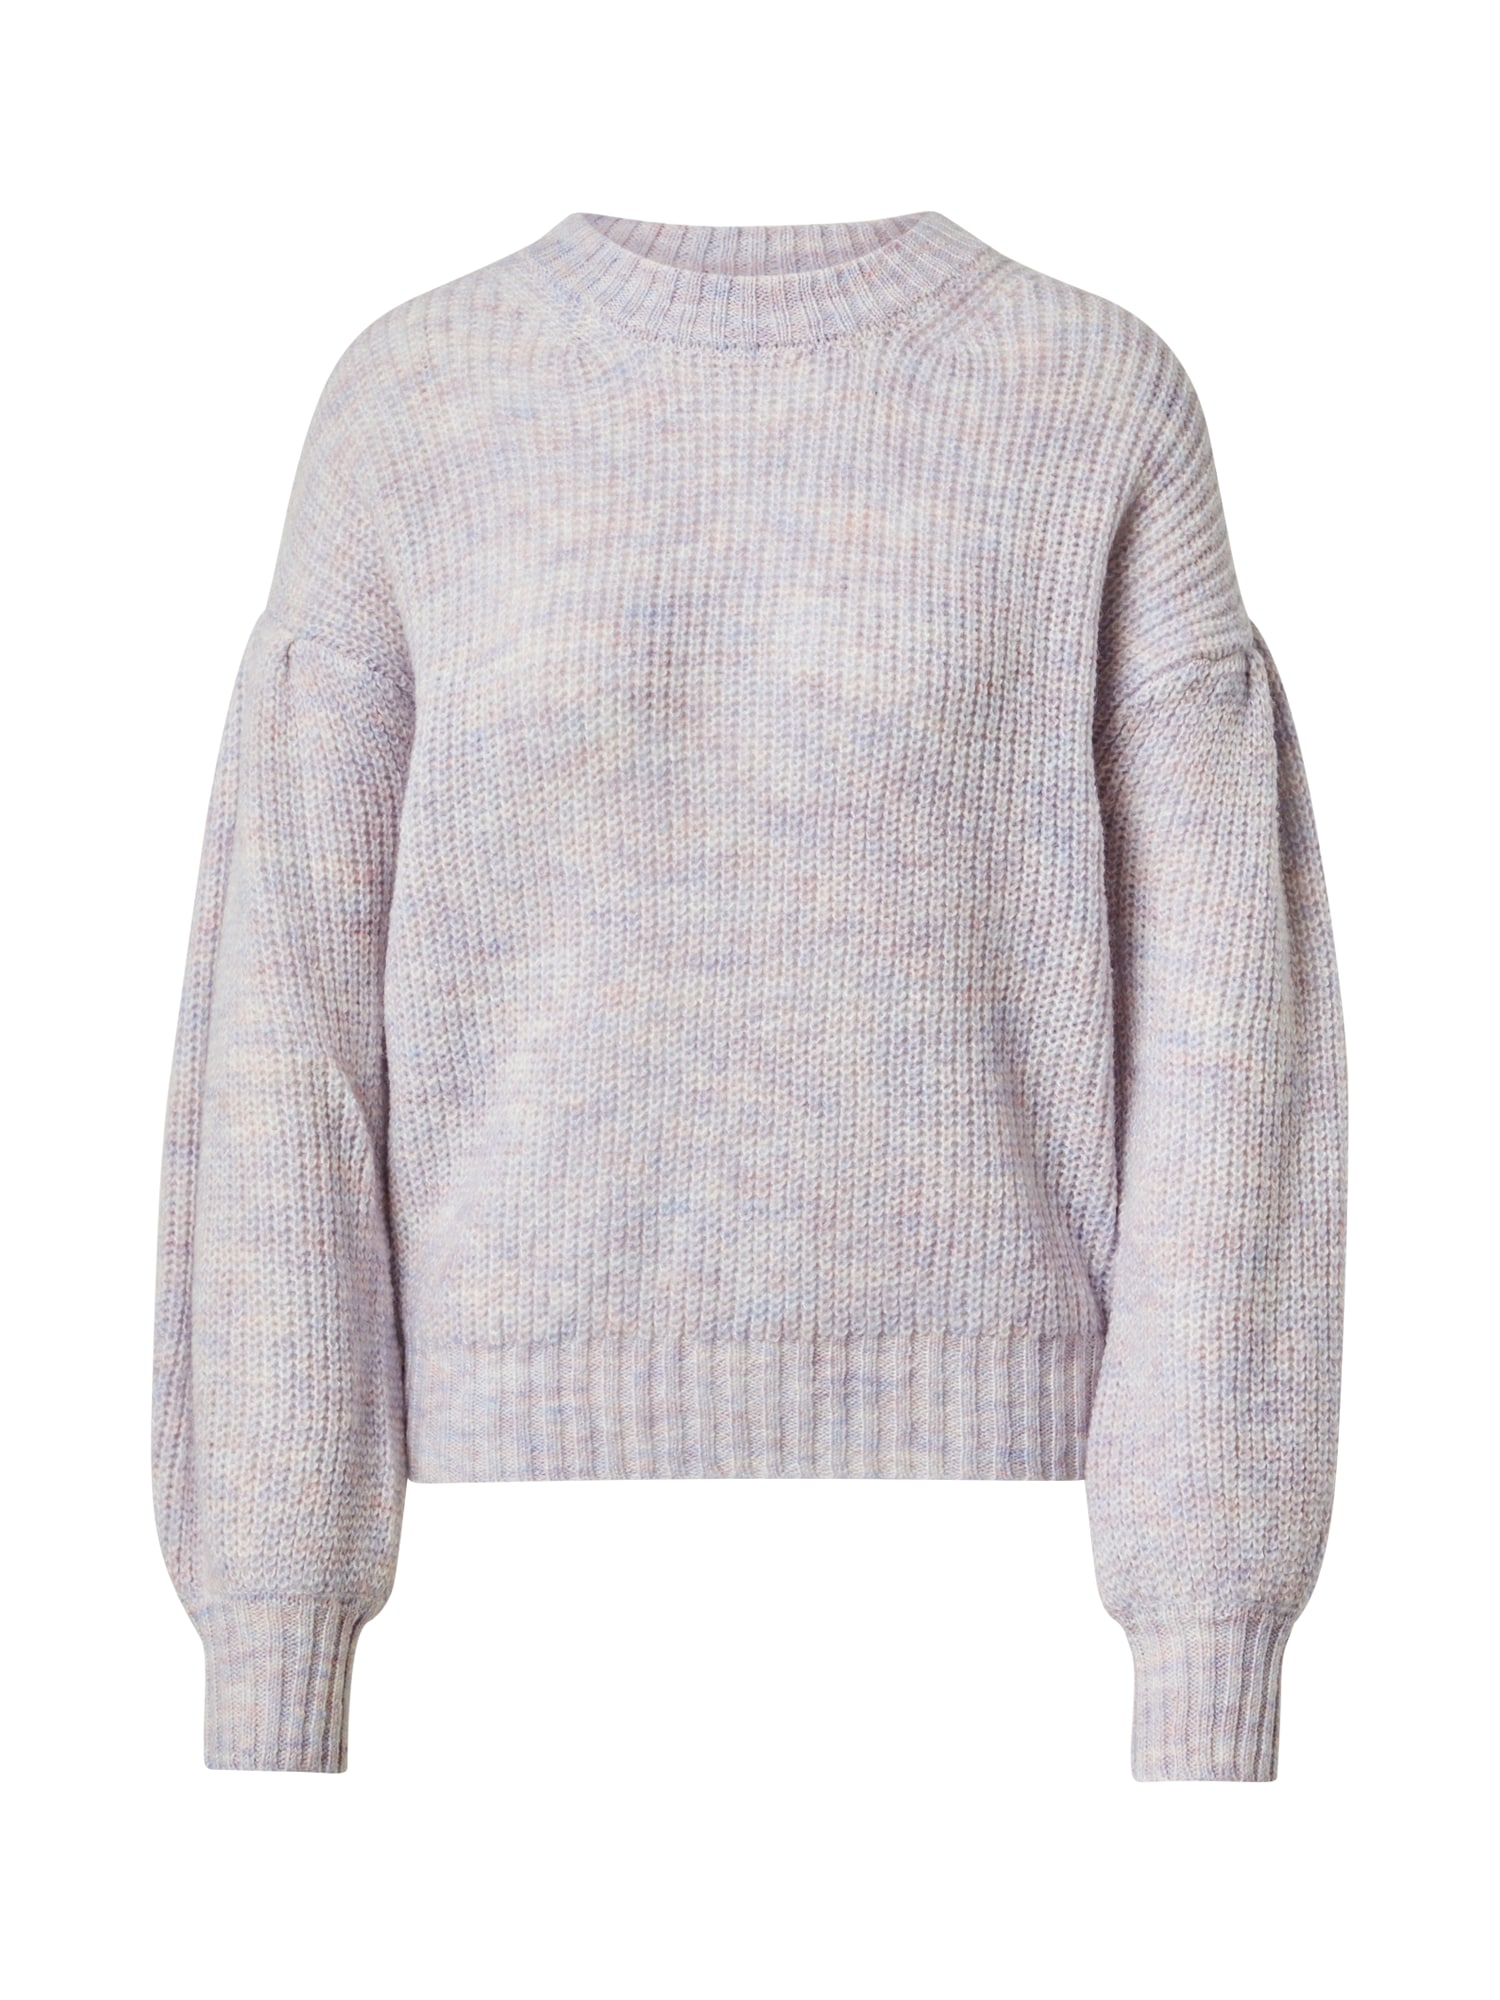 OBJECT Megztinis 'Max' margai pilka